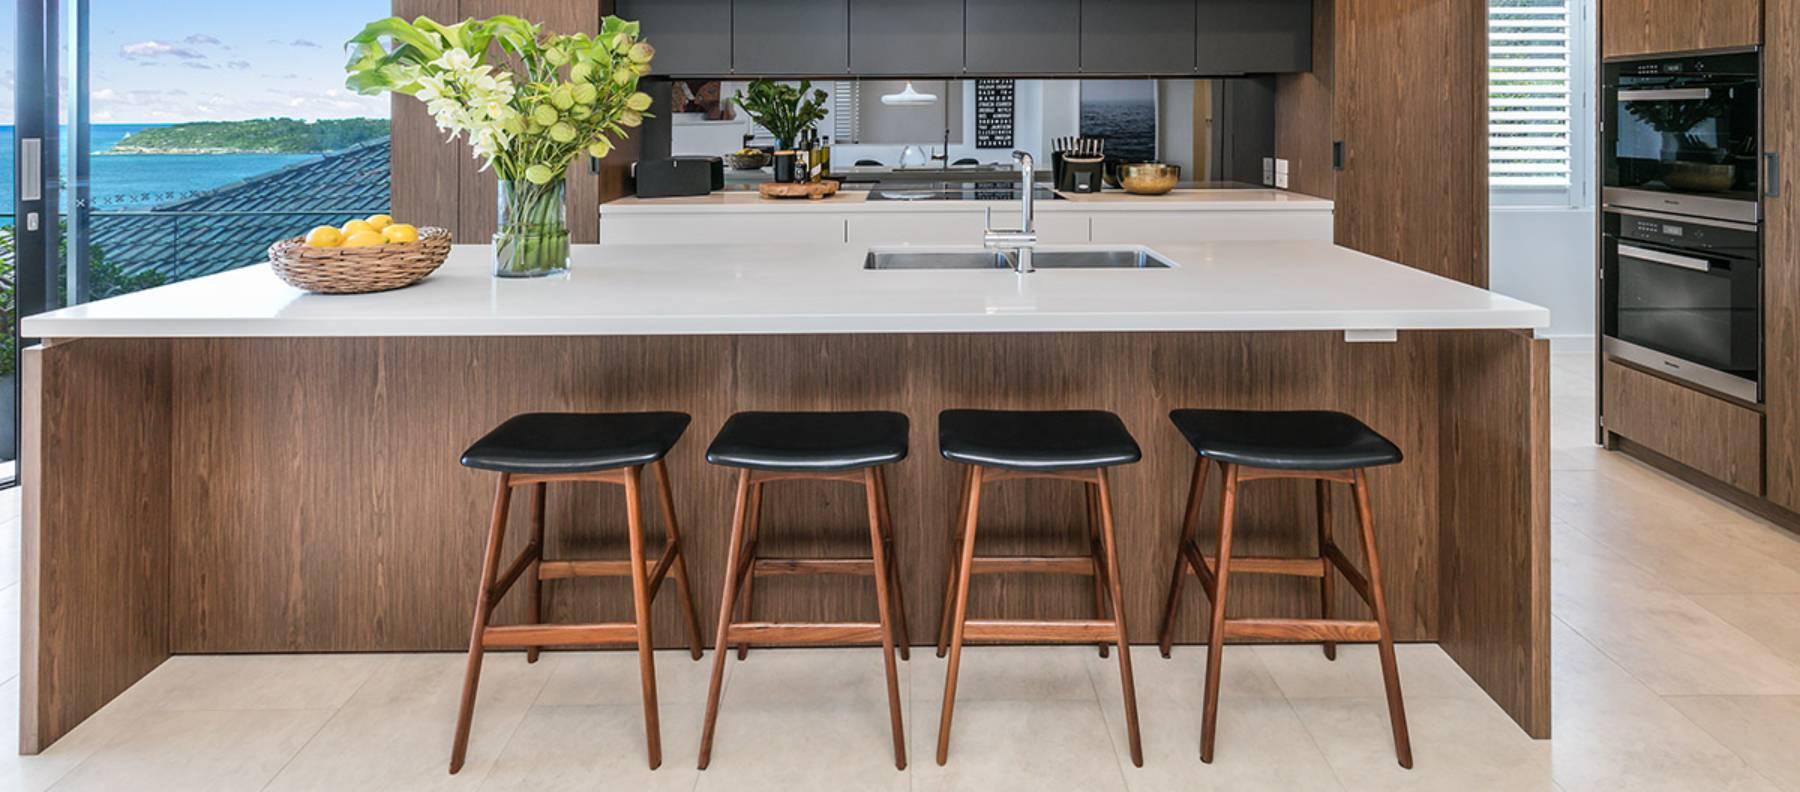 custom limestone kitchen